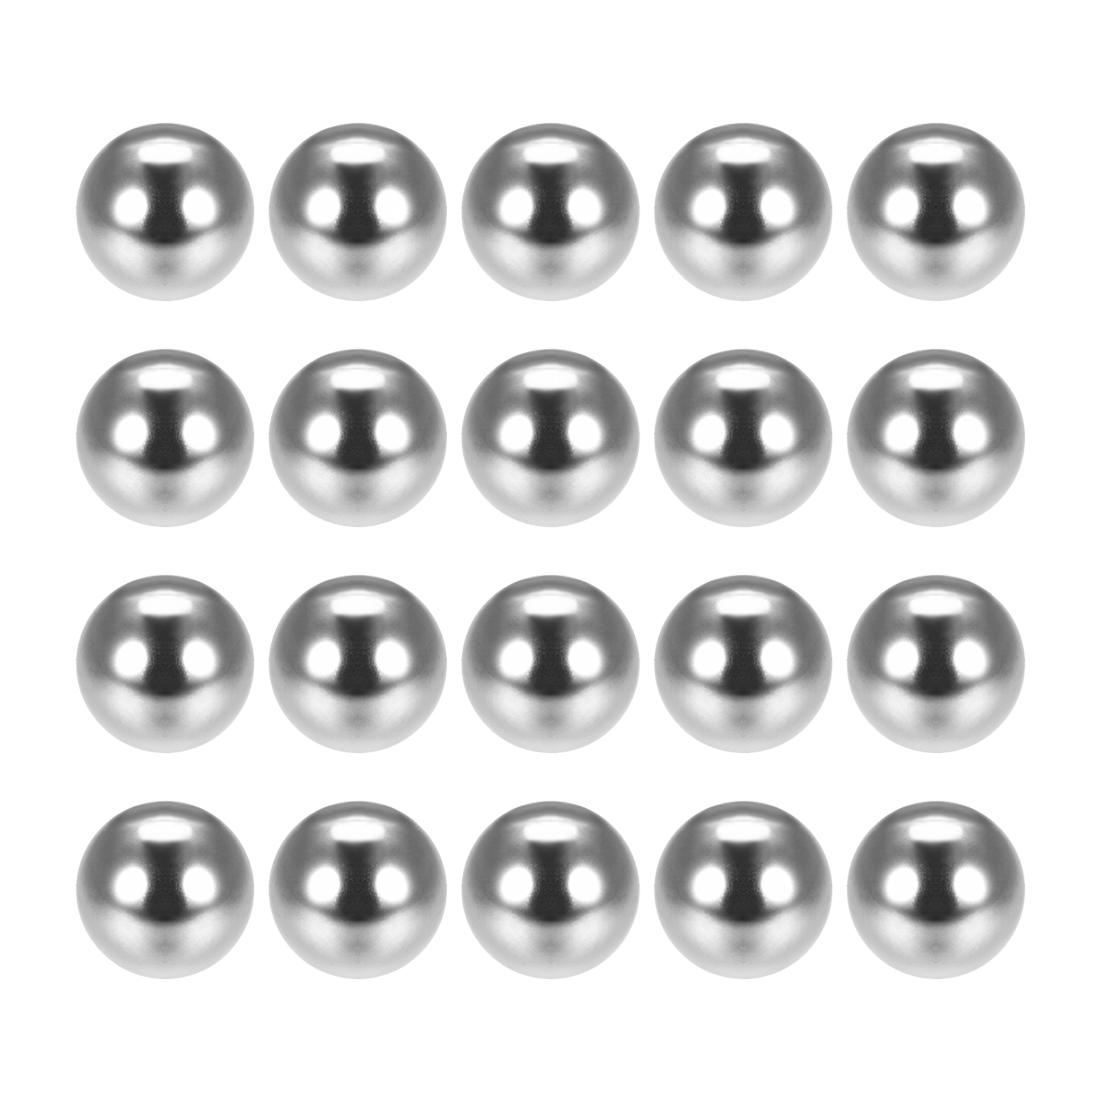 10mm Precision Chrome Steel Bearing Balls G25 30pcs